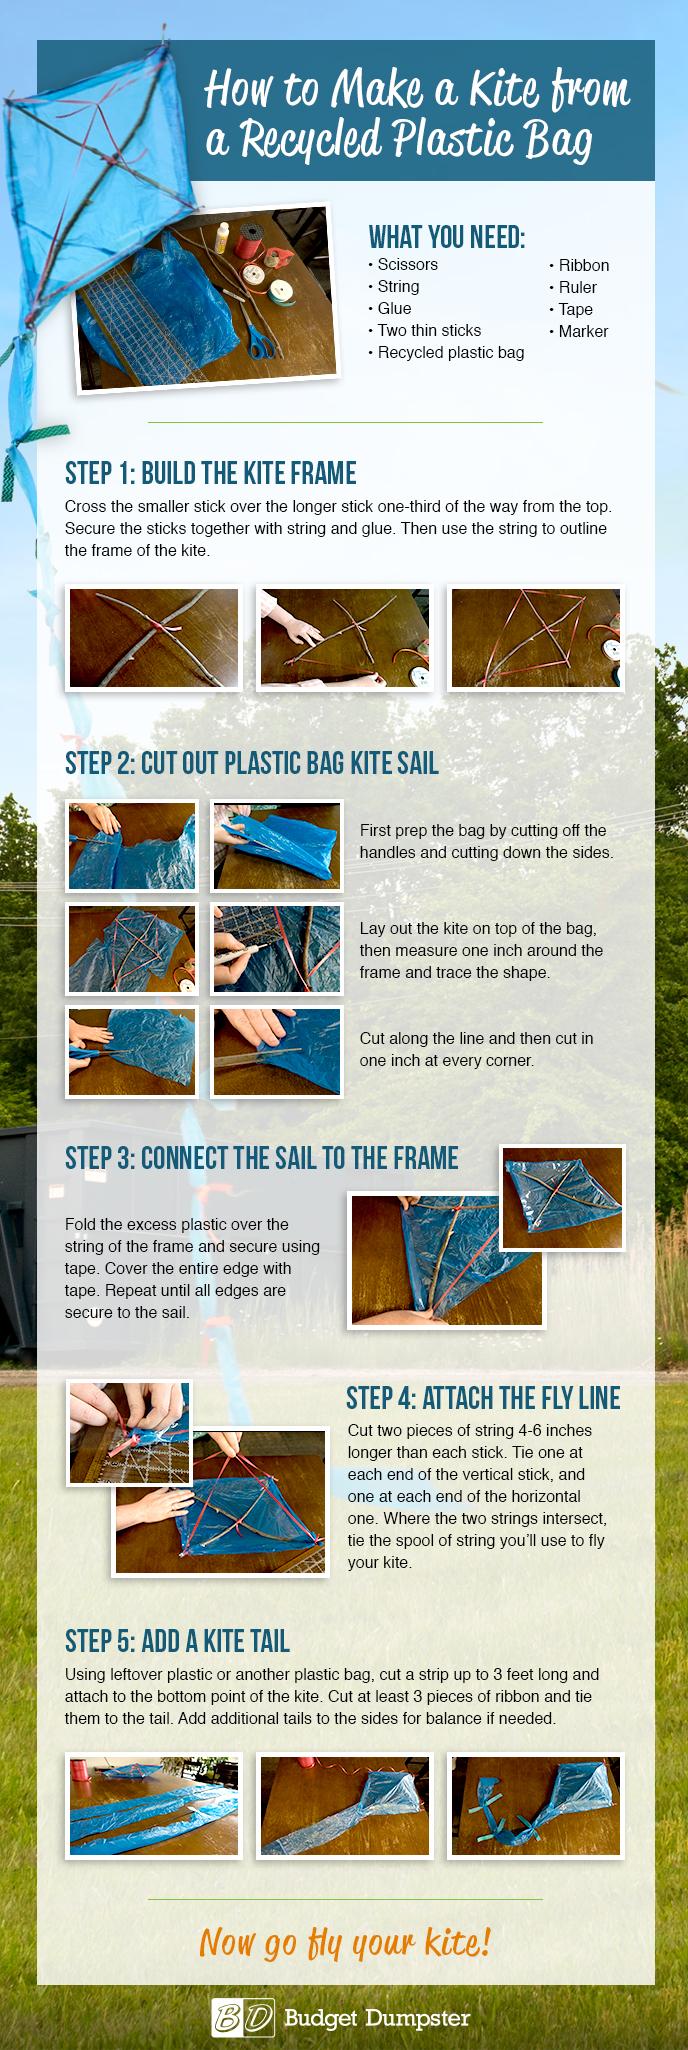 Plastic Bag Kite Infographic